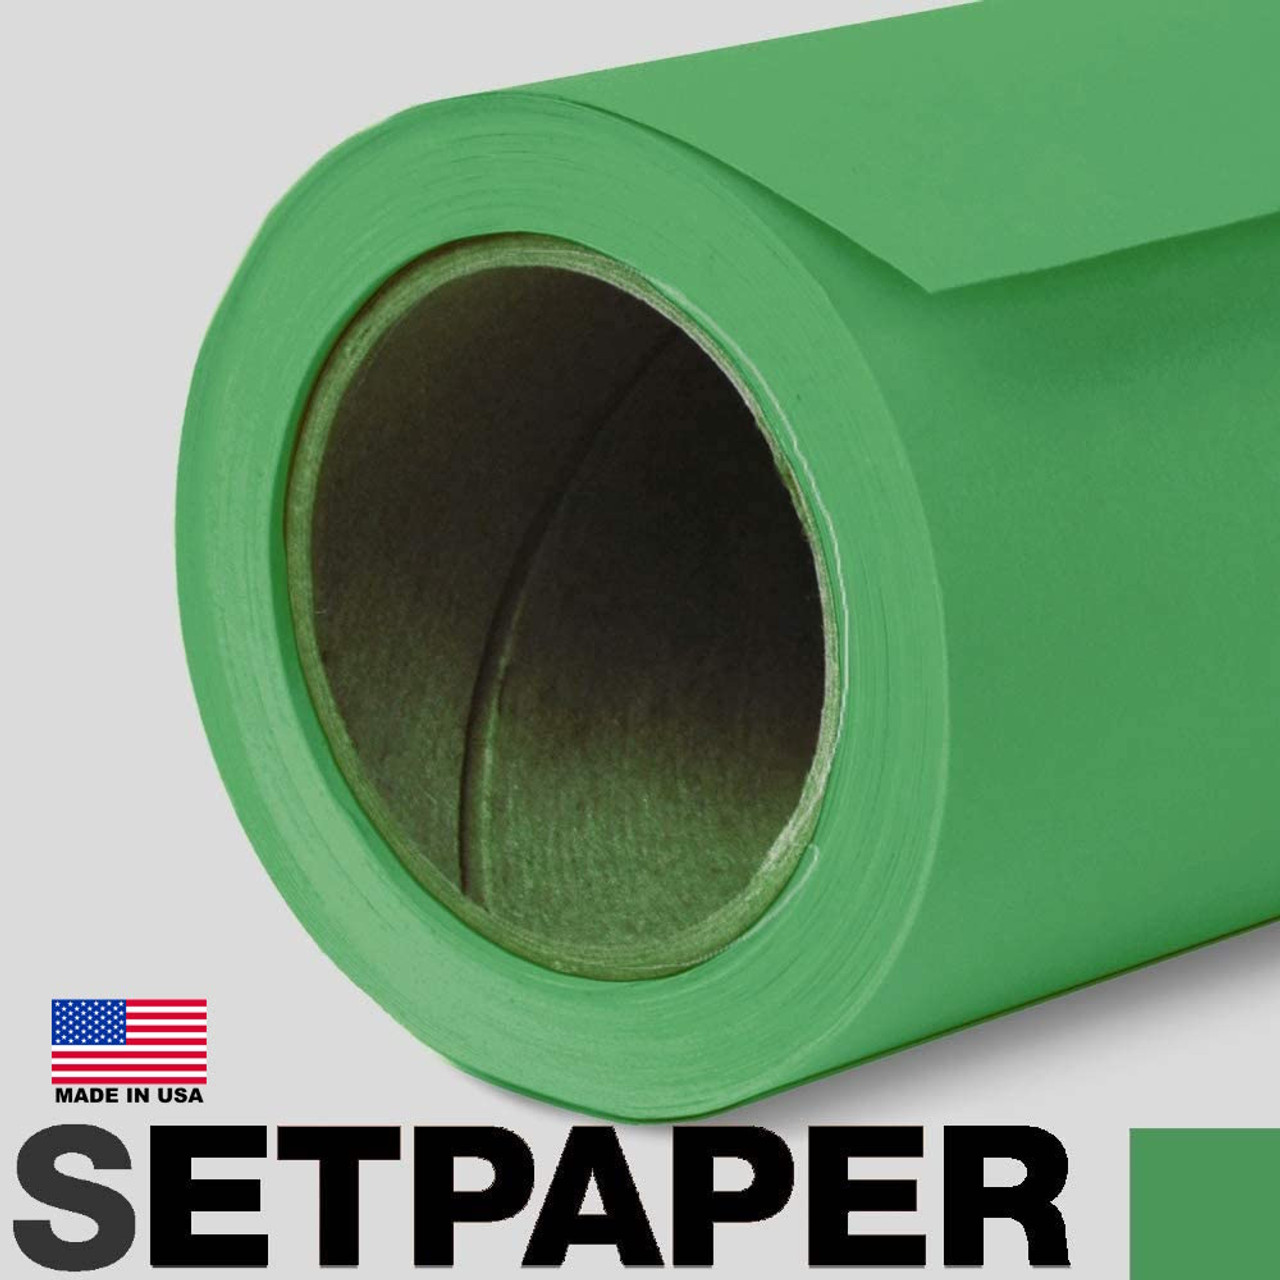 "(ECONOMIC SHIPPING) - SETPAPER - BRIGHT GREEN 48"" x 36' (1.3 x 11m)"